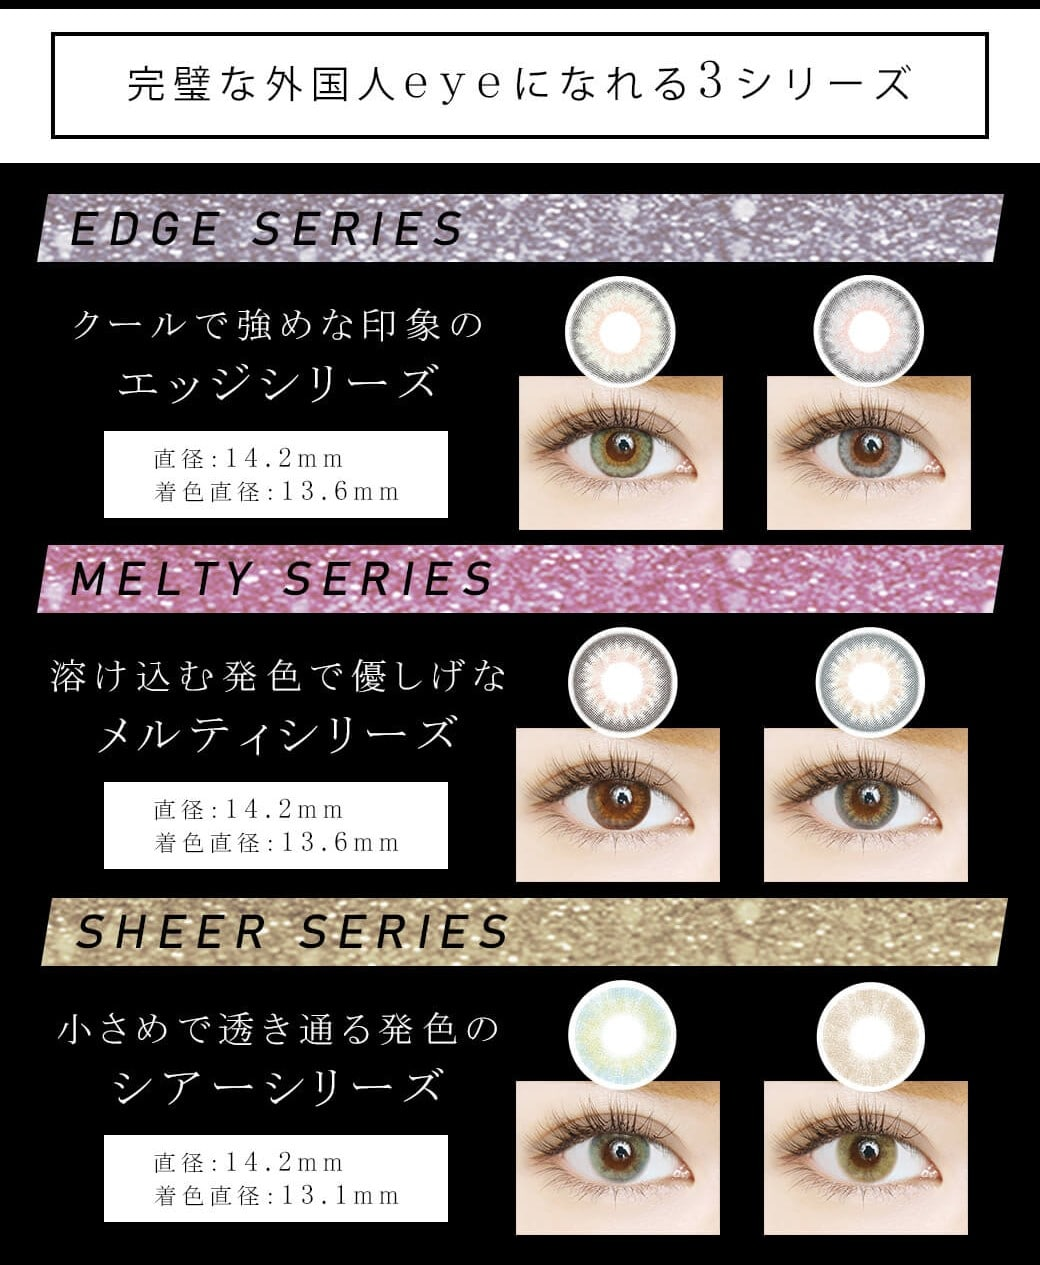 Fierce eyes by Diya完璧な外国人eyeになれる3シリーズ